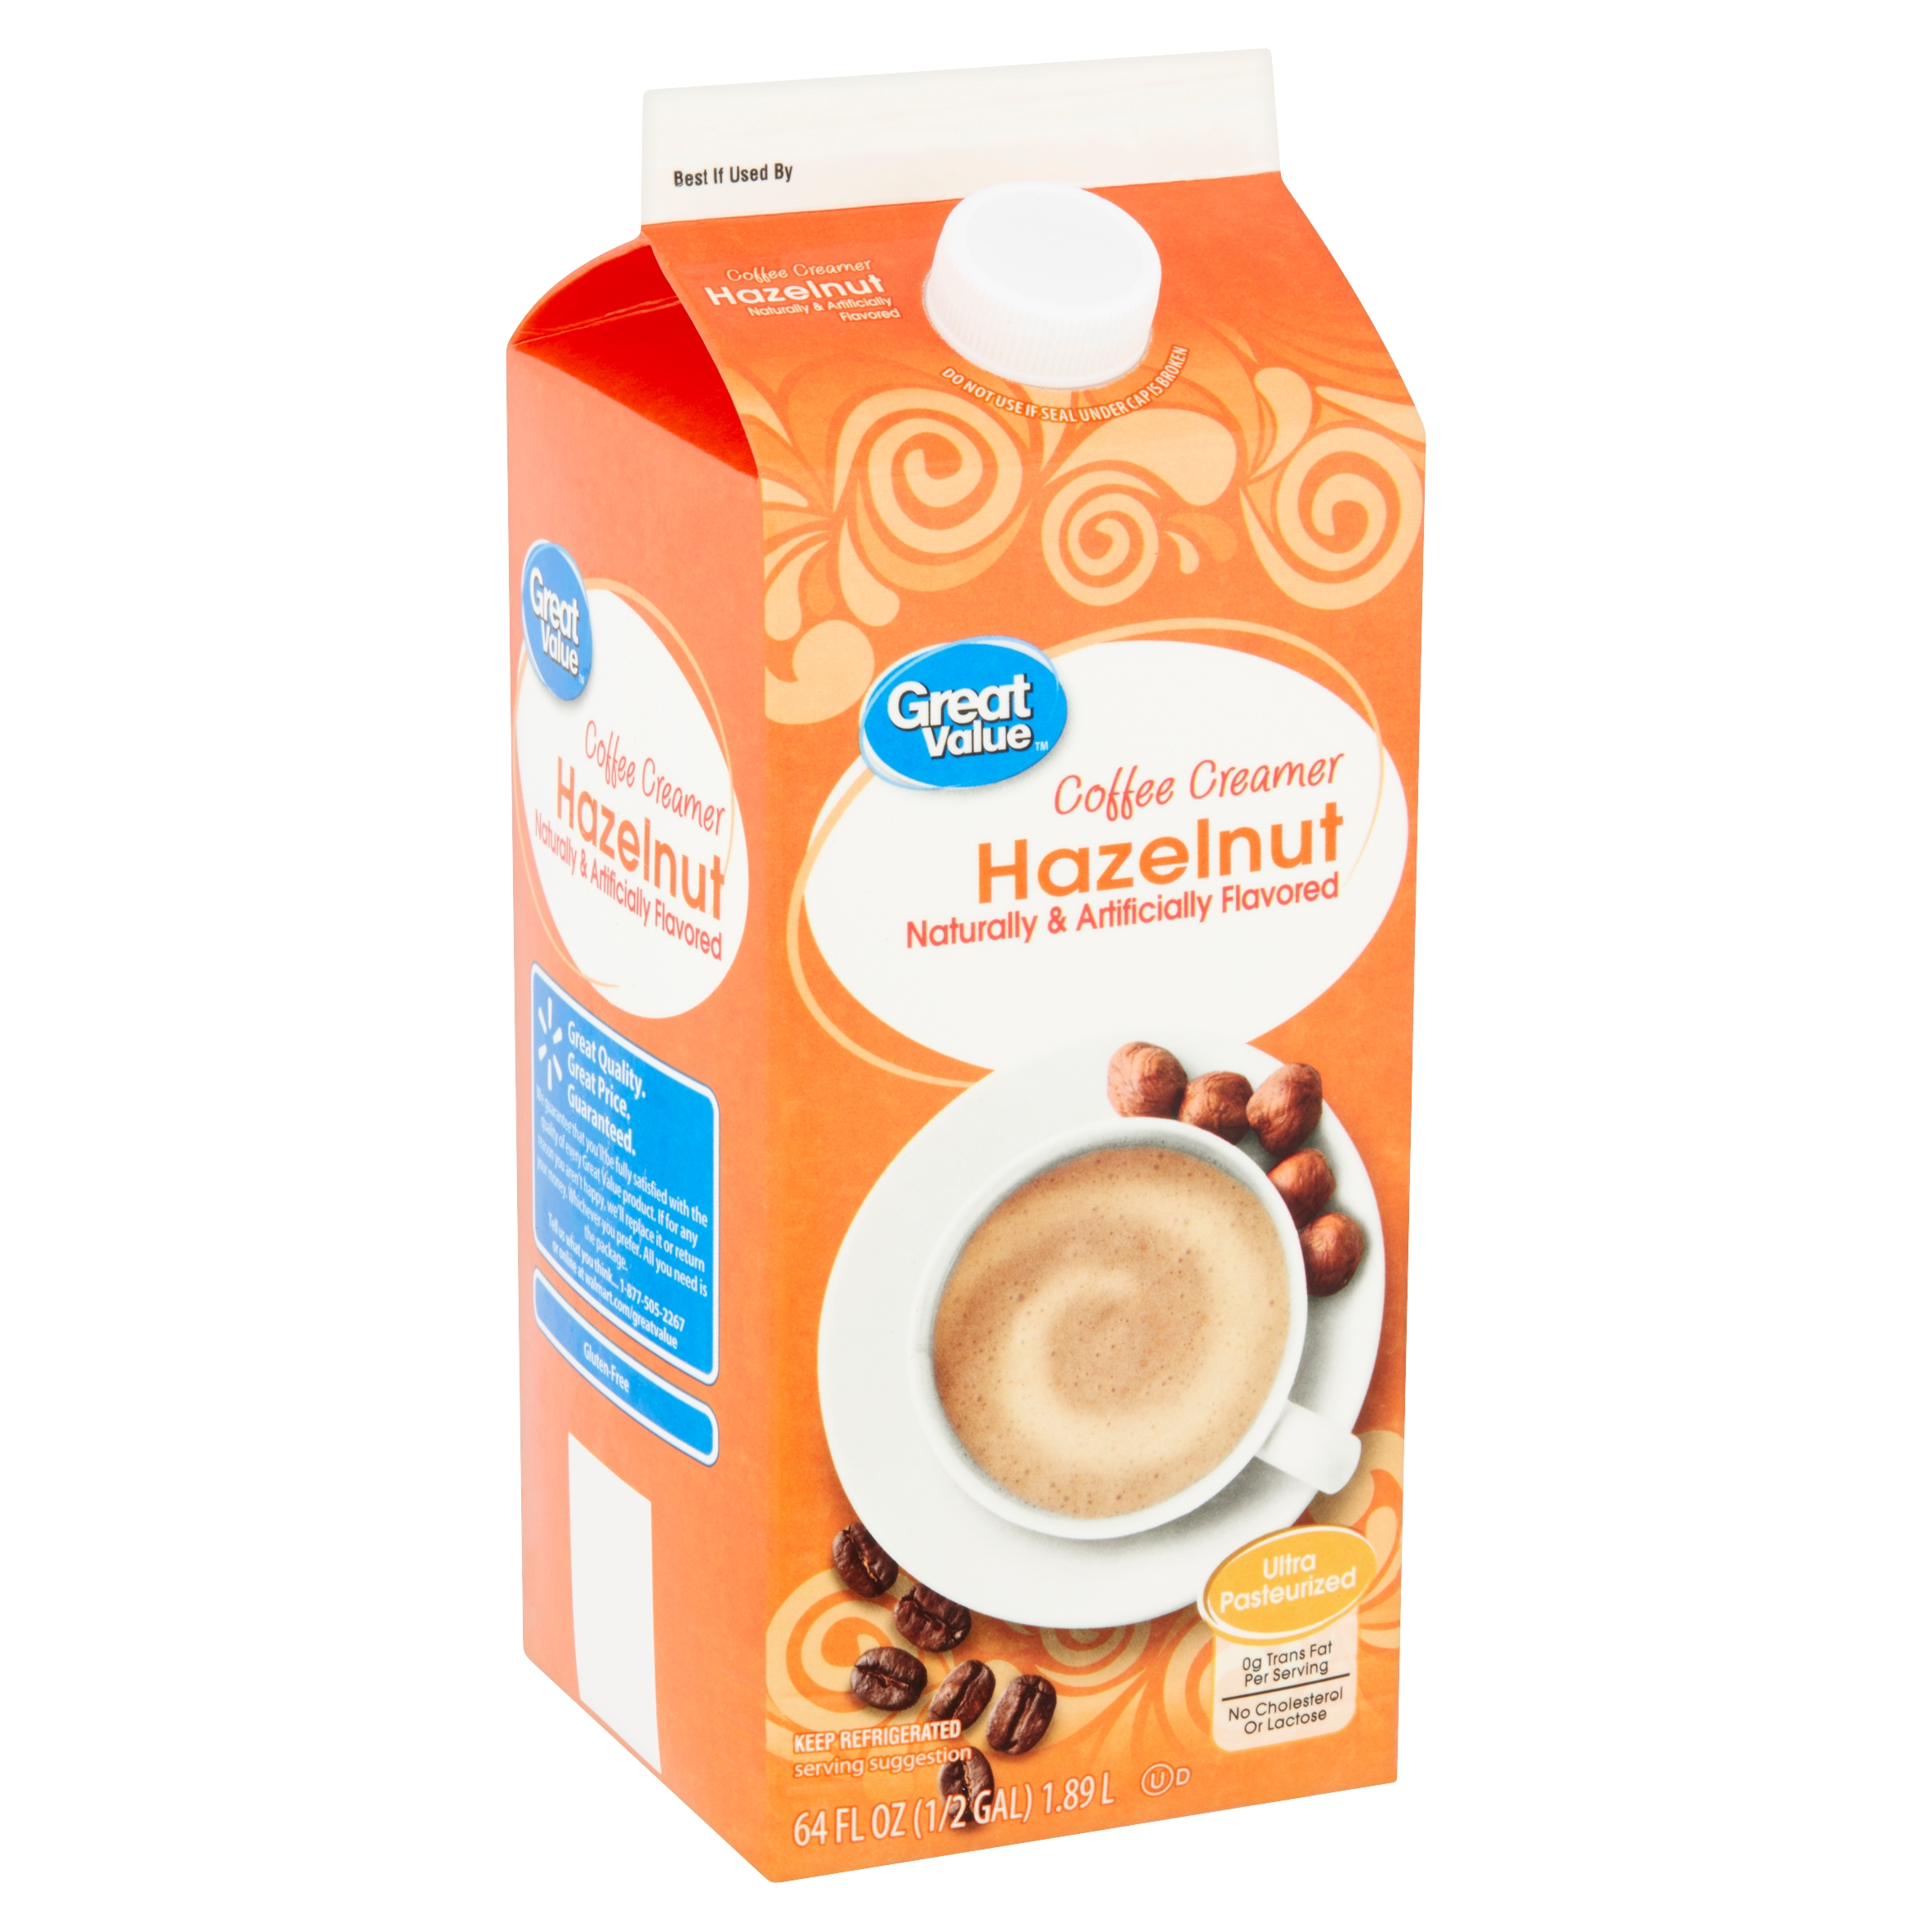 Great Value Hazelnut Coffee Creamer, 64 Fl Oz   Walmart.com